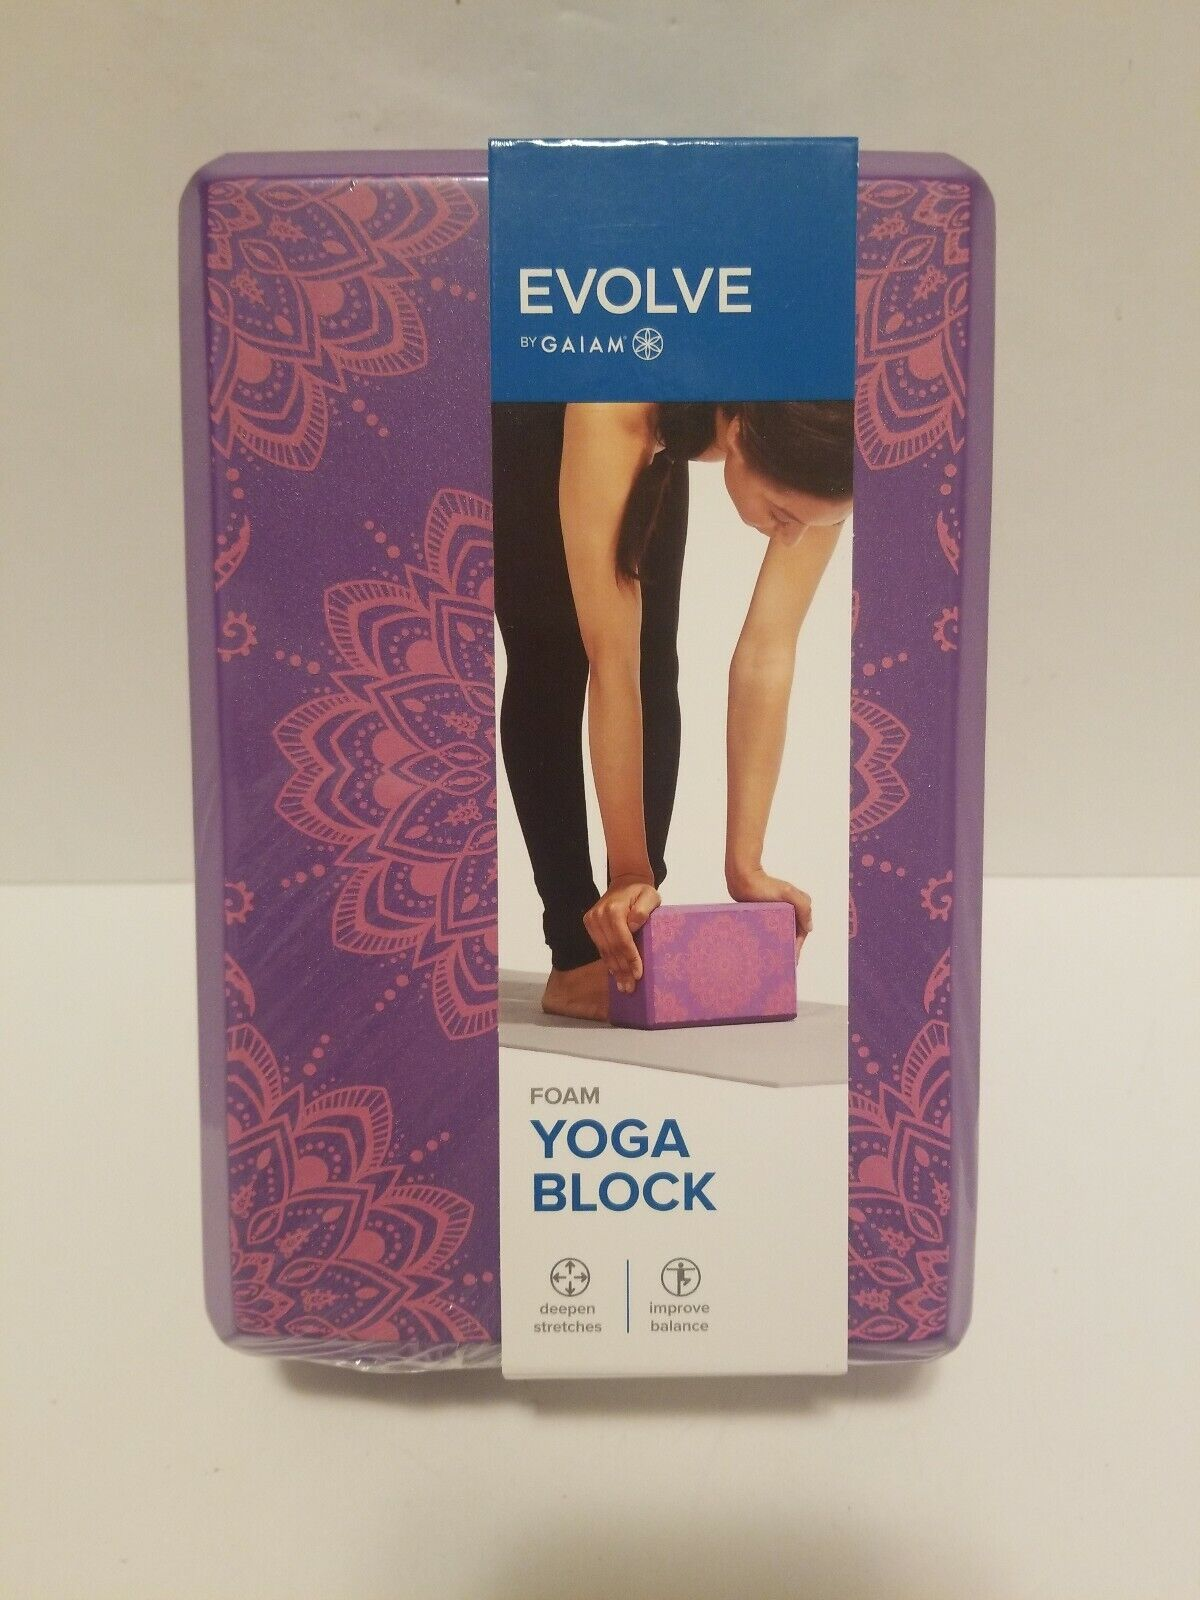 EVOLVE BY GAIAM Foam Yoga Block Purple Improves Balance